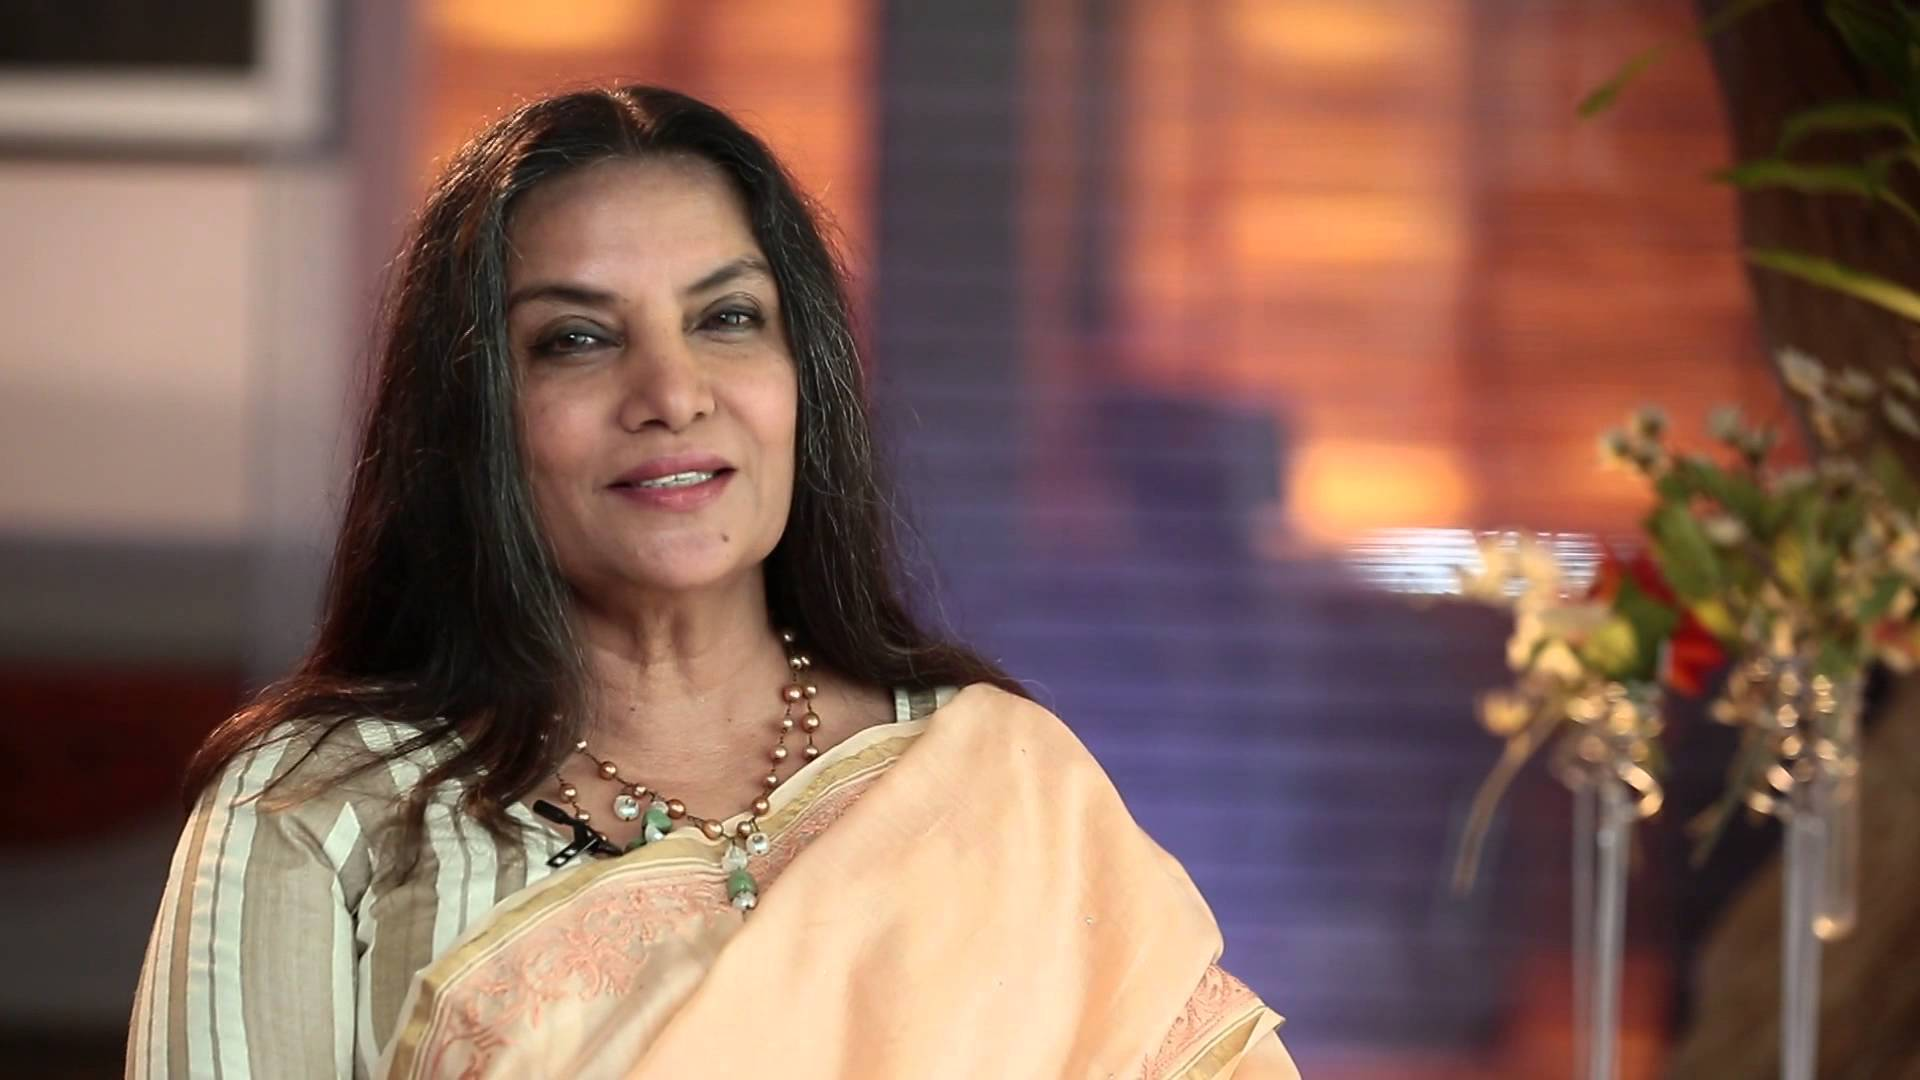 Veteran Indian actress Shabana Azmi